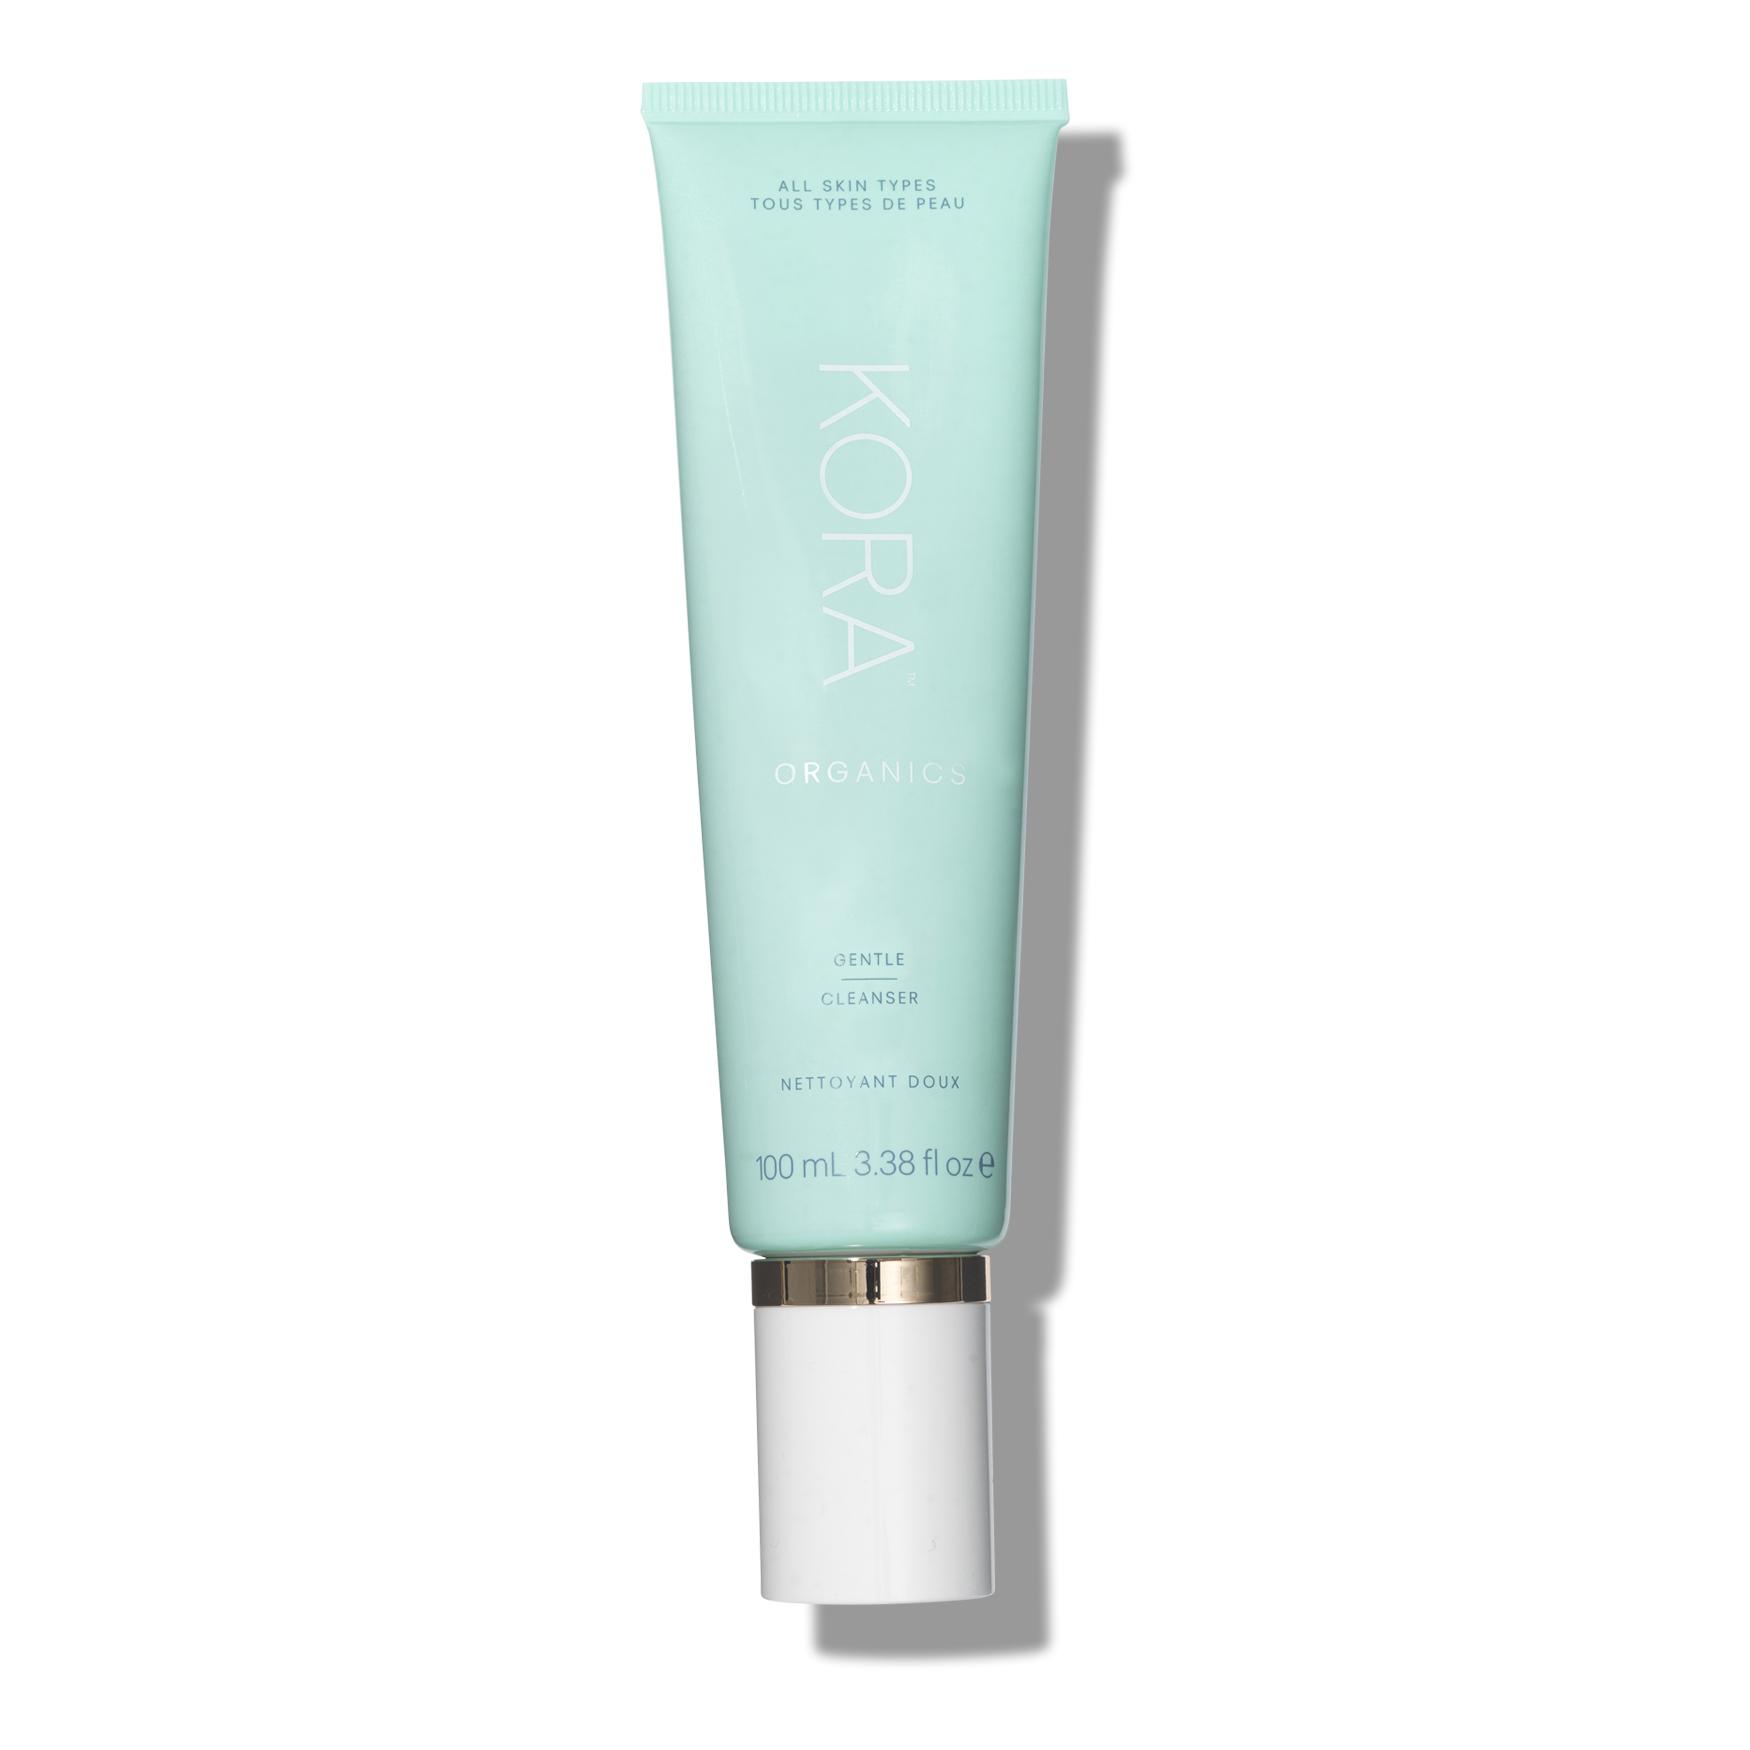 KORA ORGANICS | Gentle Cleanser For Sensitive Skin